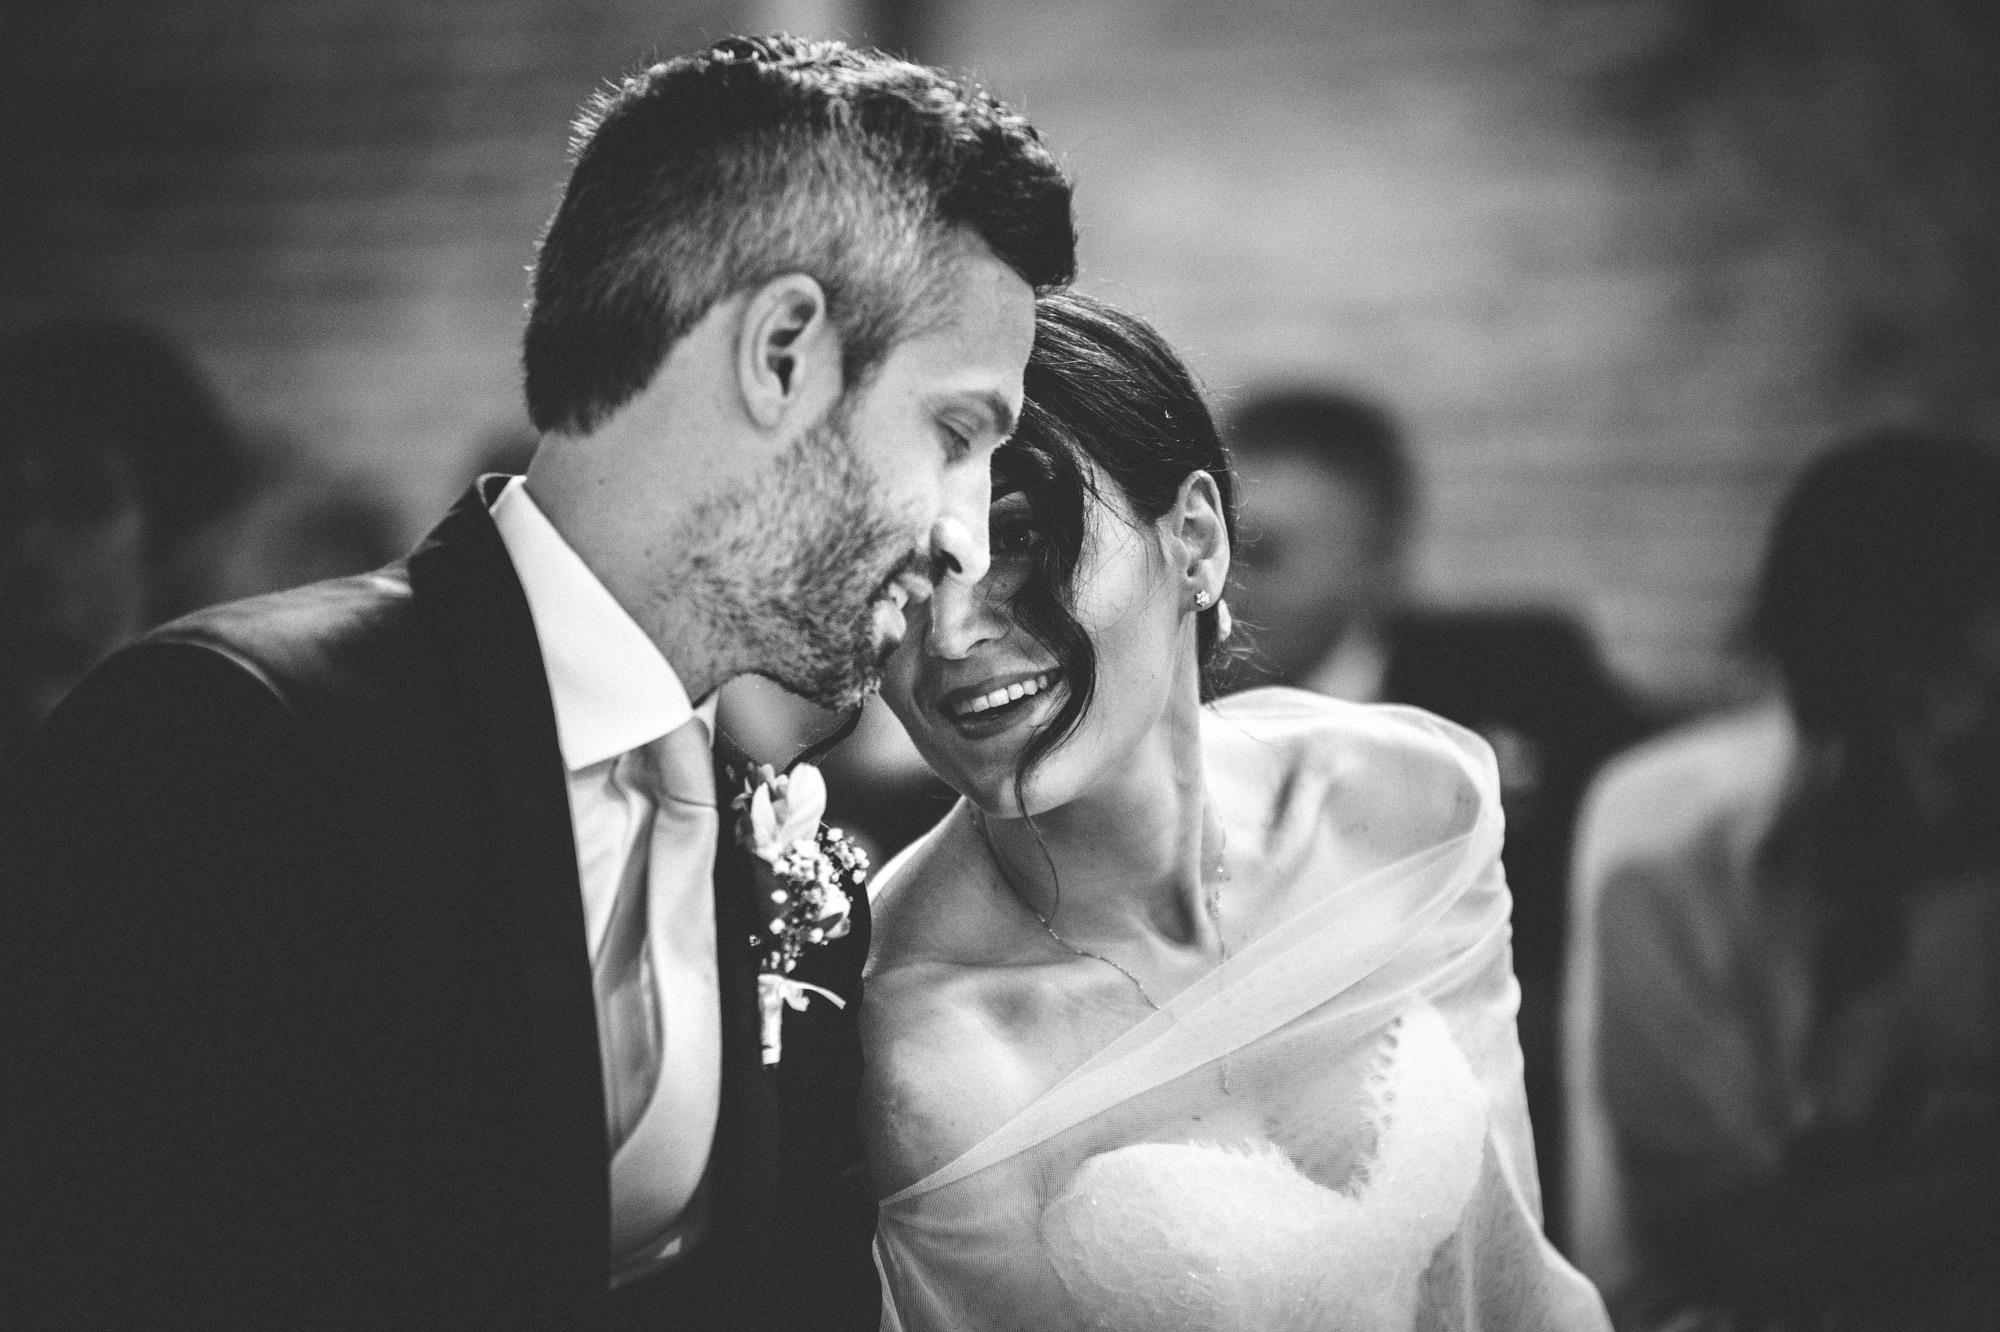 fotografa-matrimonio-rimini-silvia-marco